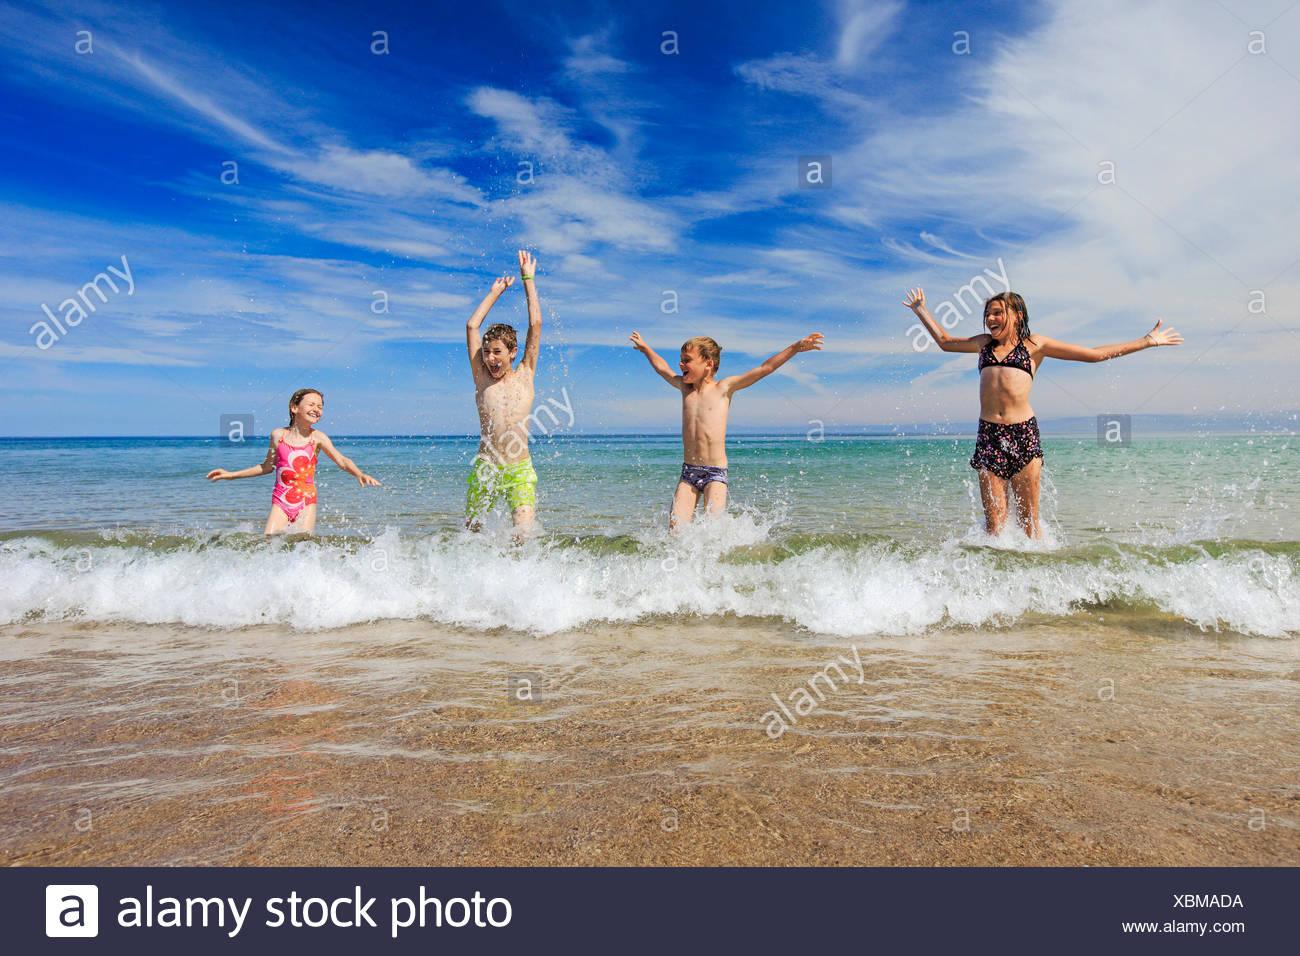 4, activity, swimming trunks, swim suit, joy, sky, hands, youngsters, boy, children, boy, coast, sea, girl, fun, joke, play, spor - Stock Image